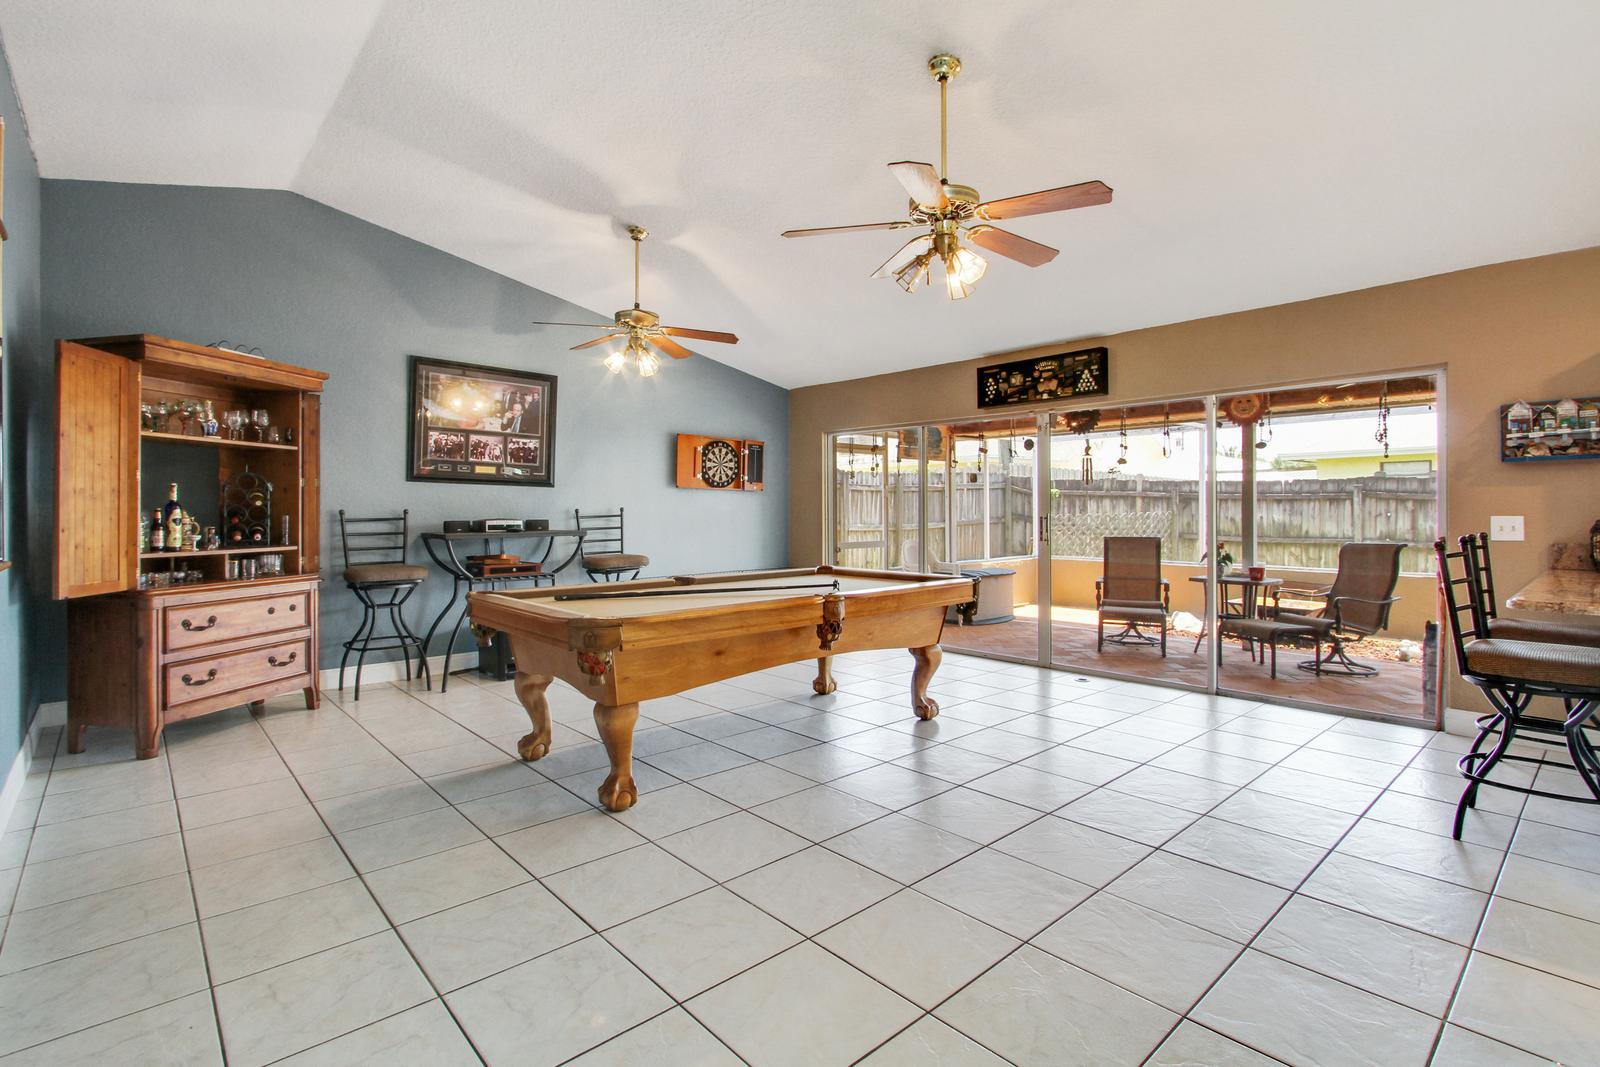 100 Nautical Family Room Furniture Home Library Design Backyard Patio Design Ideas Get 20